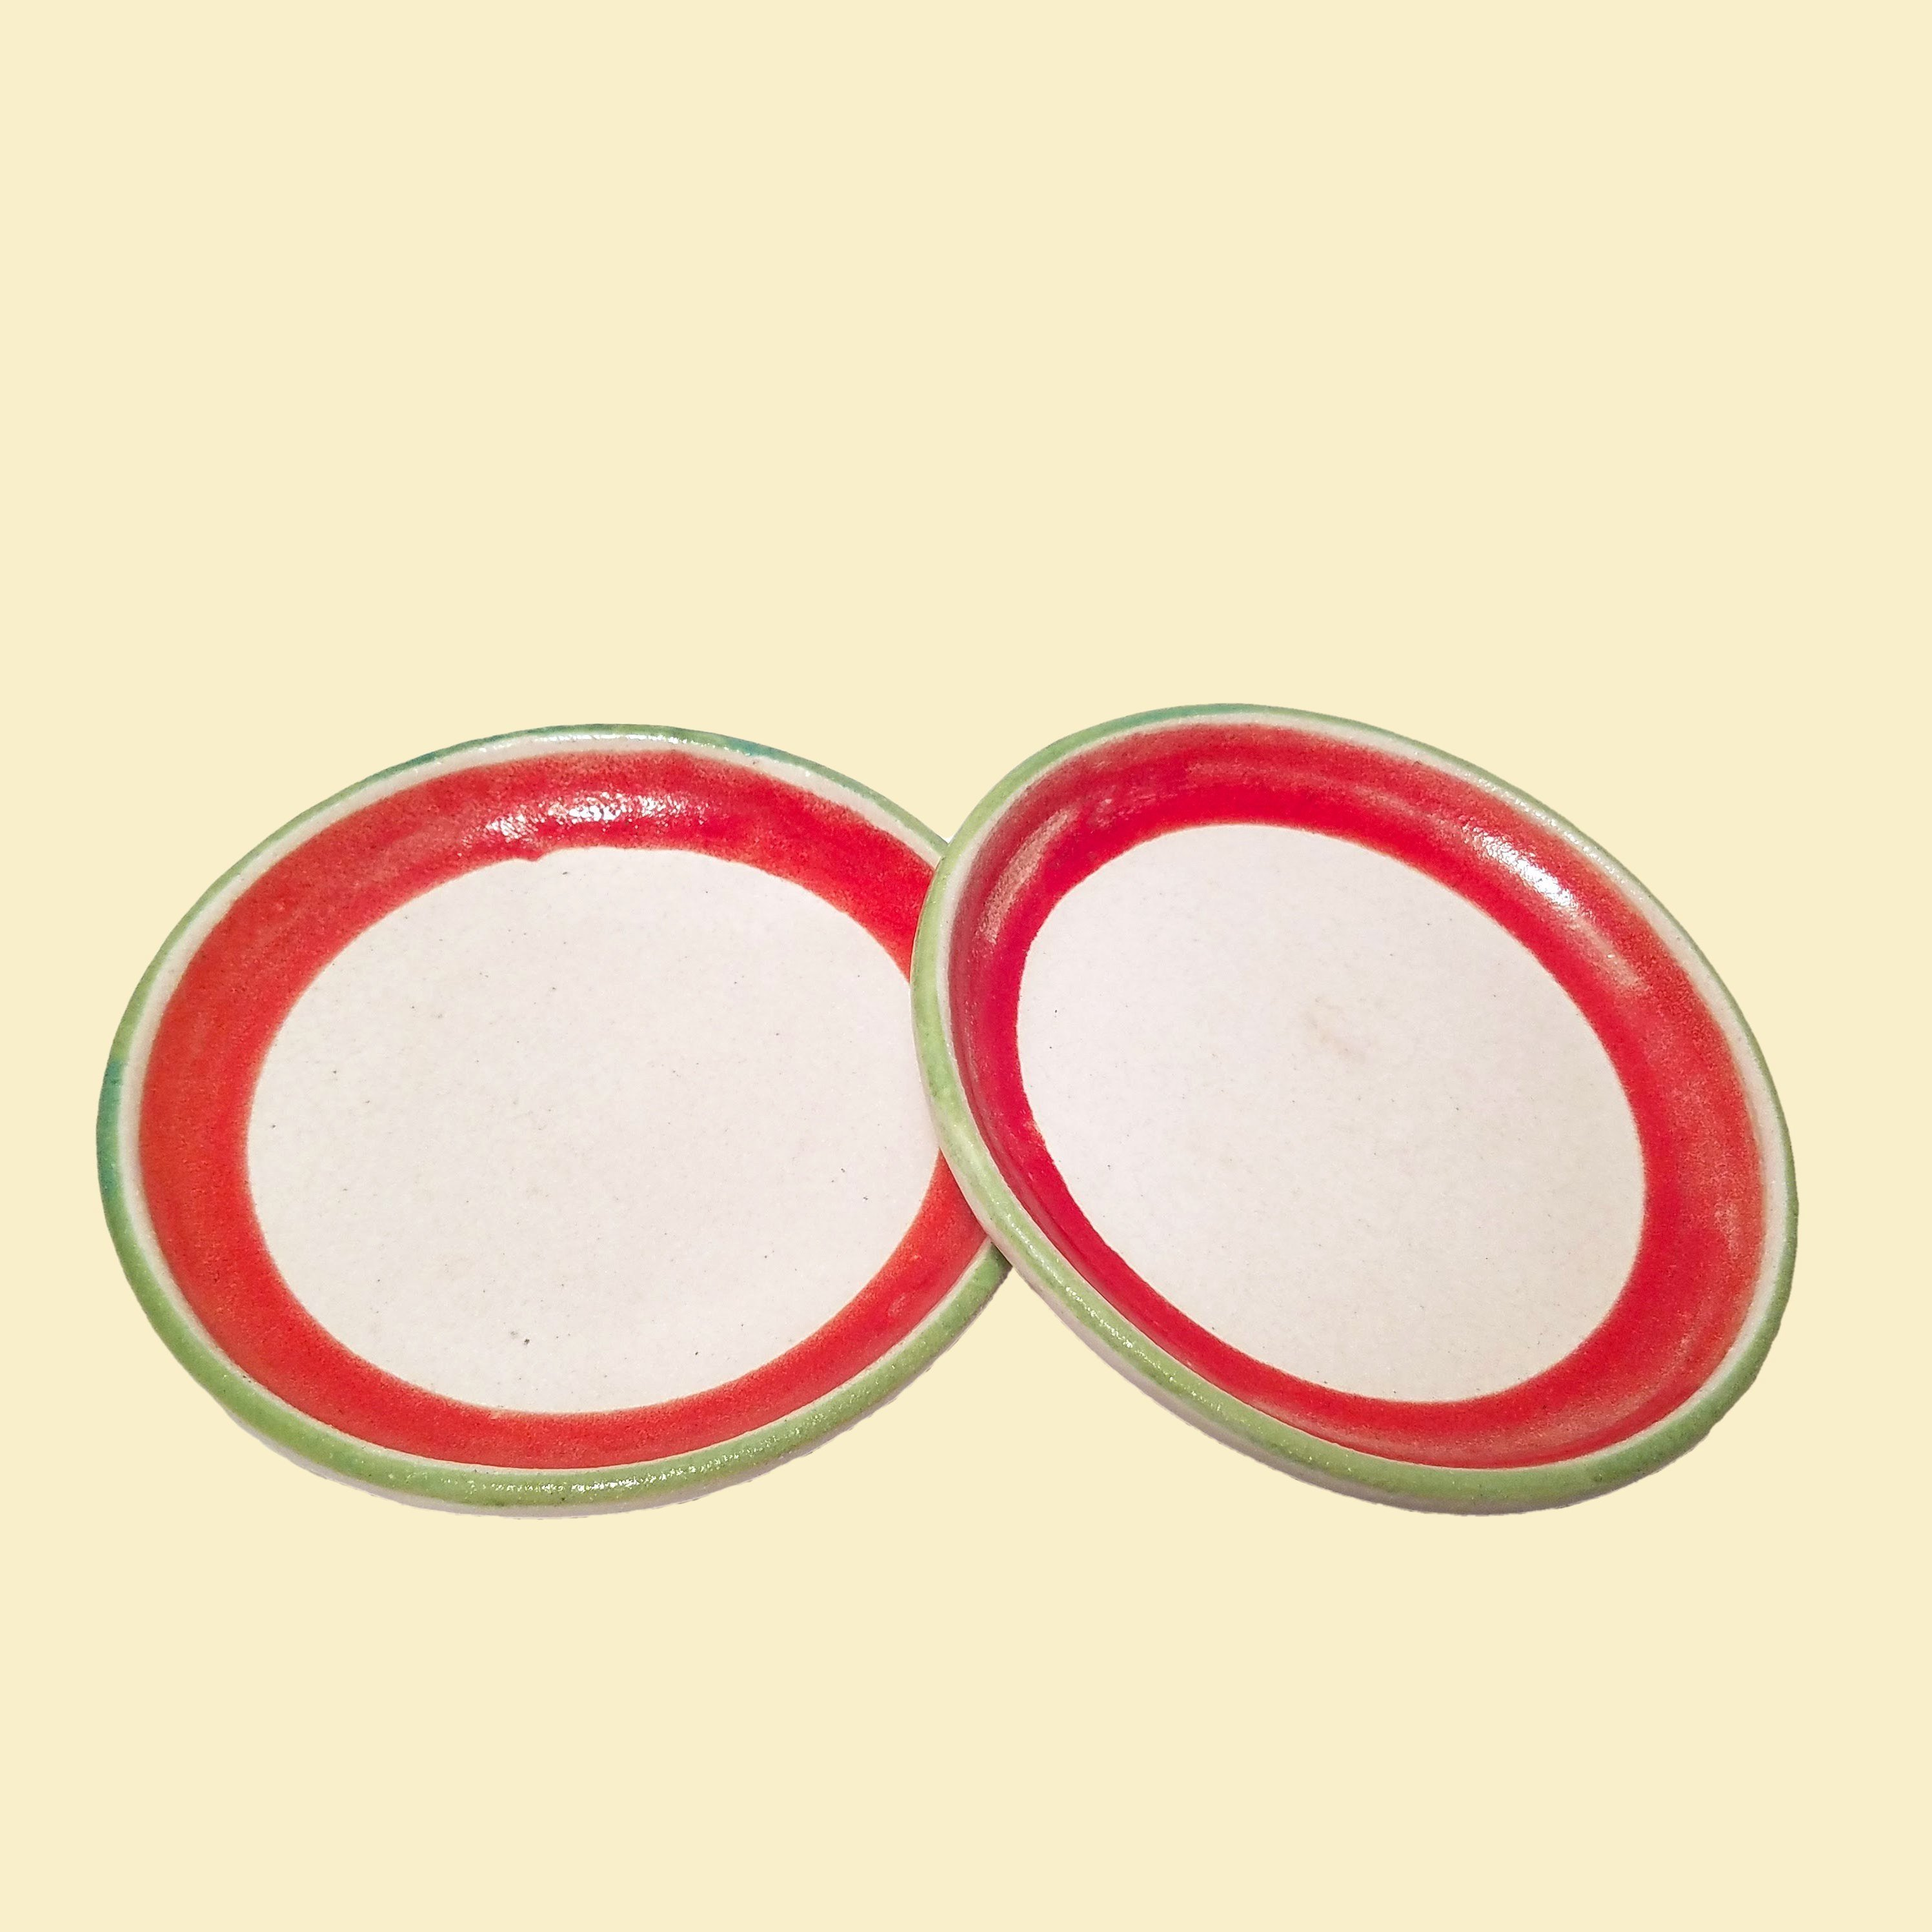 20% OFF - Desimone Ceramics Small Majolica Plates Hand Painted